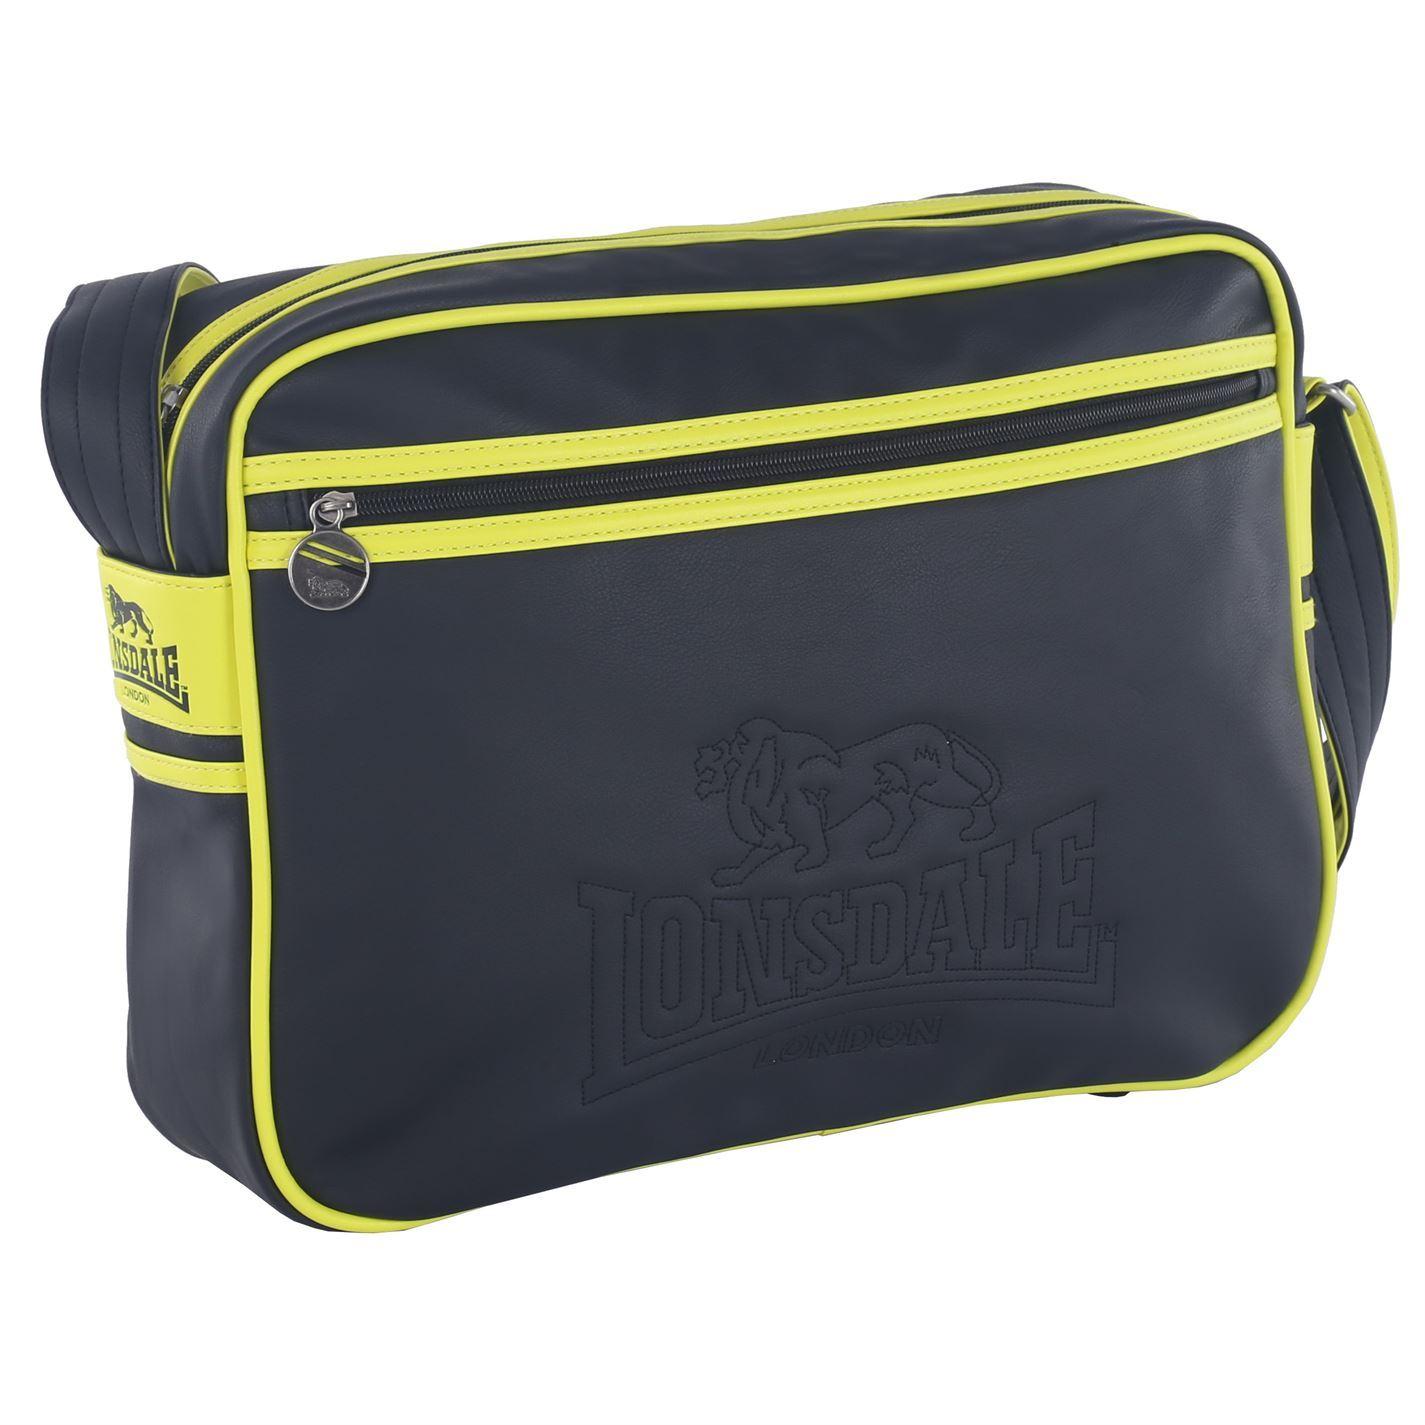 be2fcad6edf Details about Lonsdale Fluorescent Flight Bag Luggage Storage Carry Shoulder  Strap Accessories